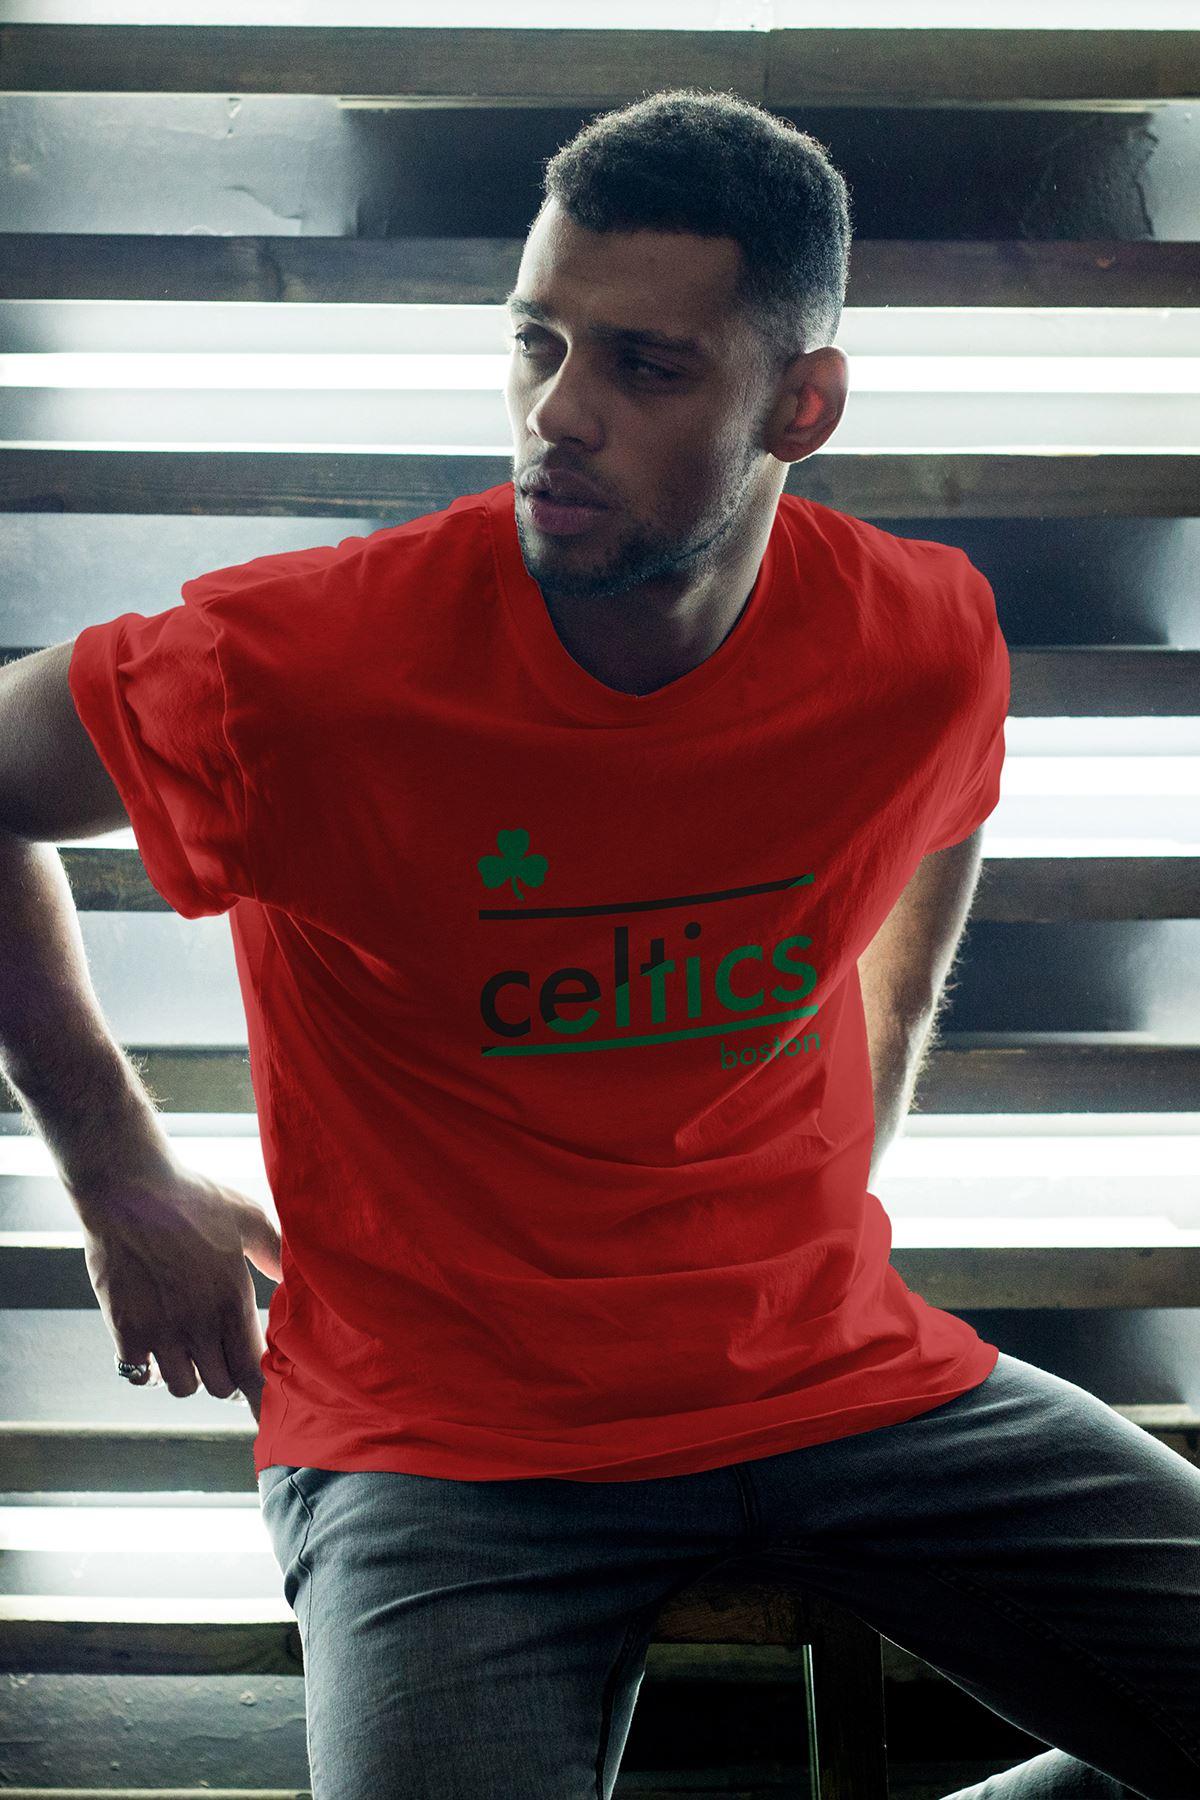 Boston Celtics 25 Kırmızı Erkek Oversize Tshirt - Tişört